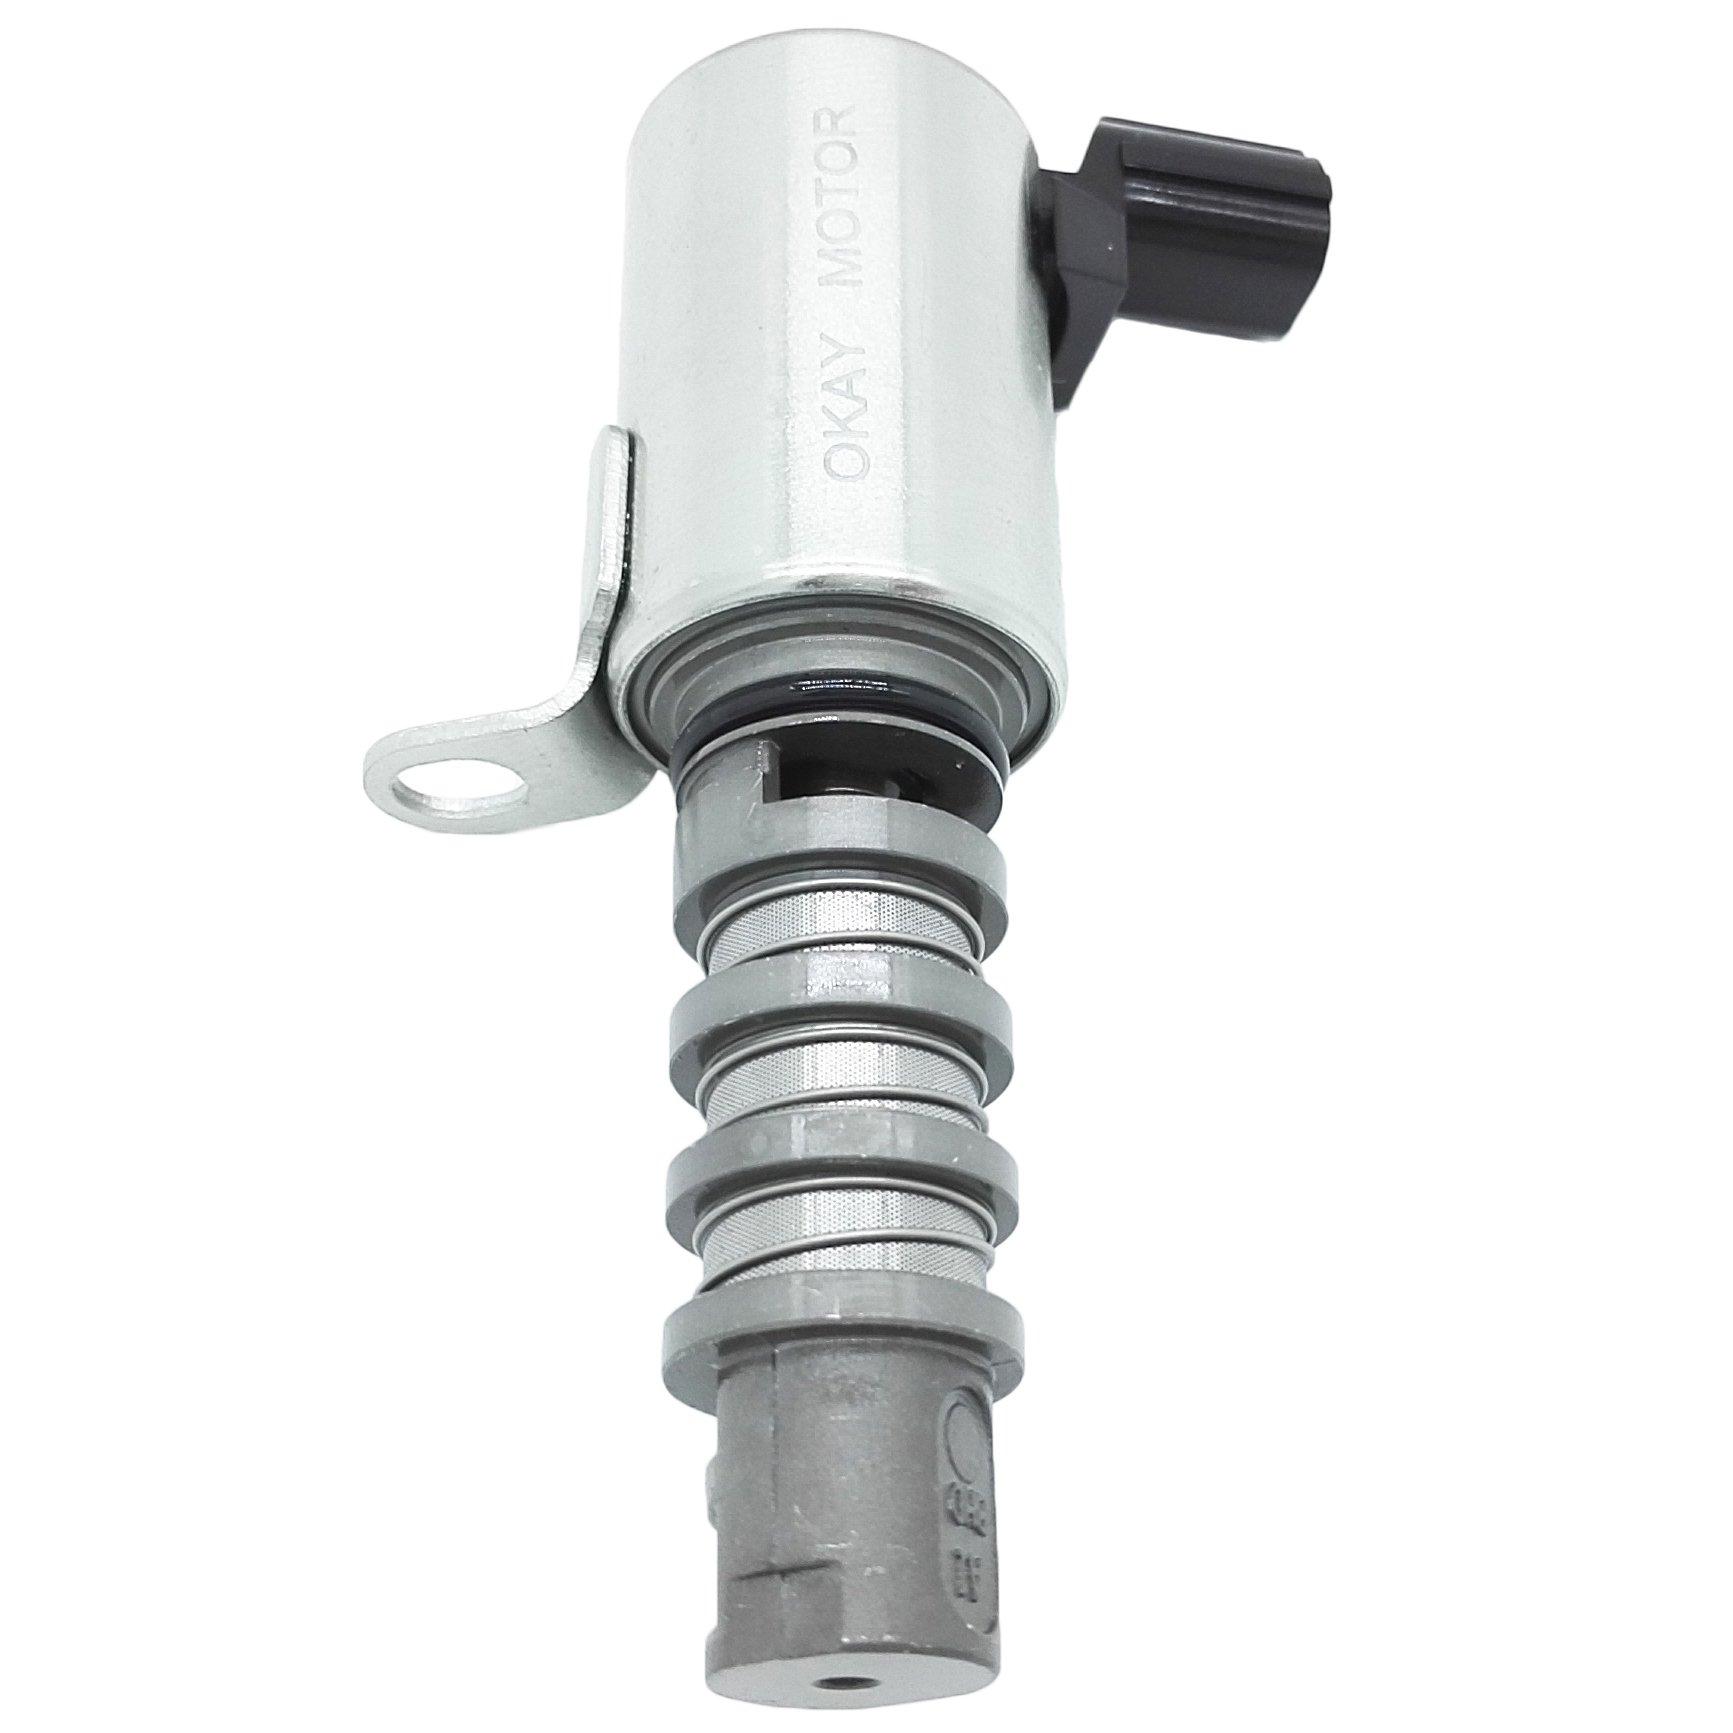 OKAY MOTOR VTC Oil Control Valve Variable Timing Solenoid for Honda Civic CRV Acura TSX